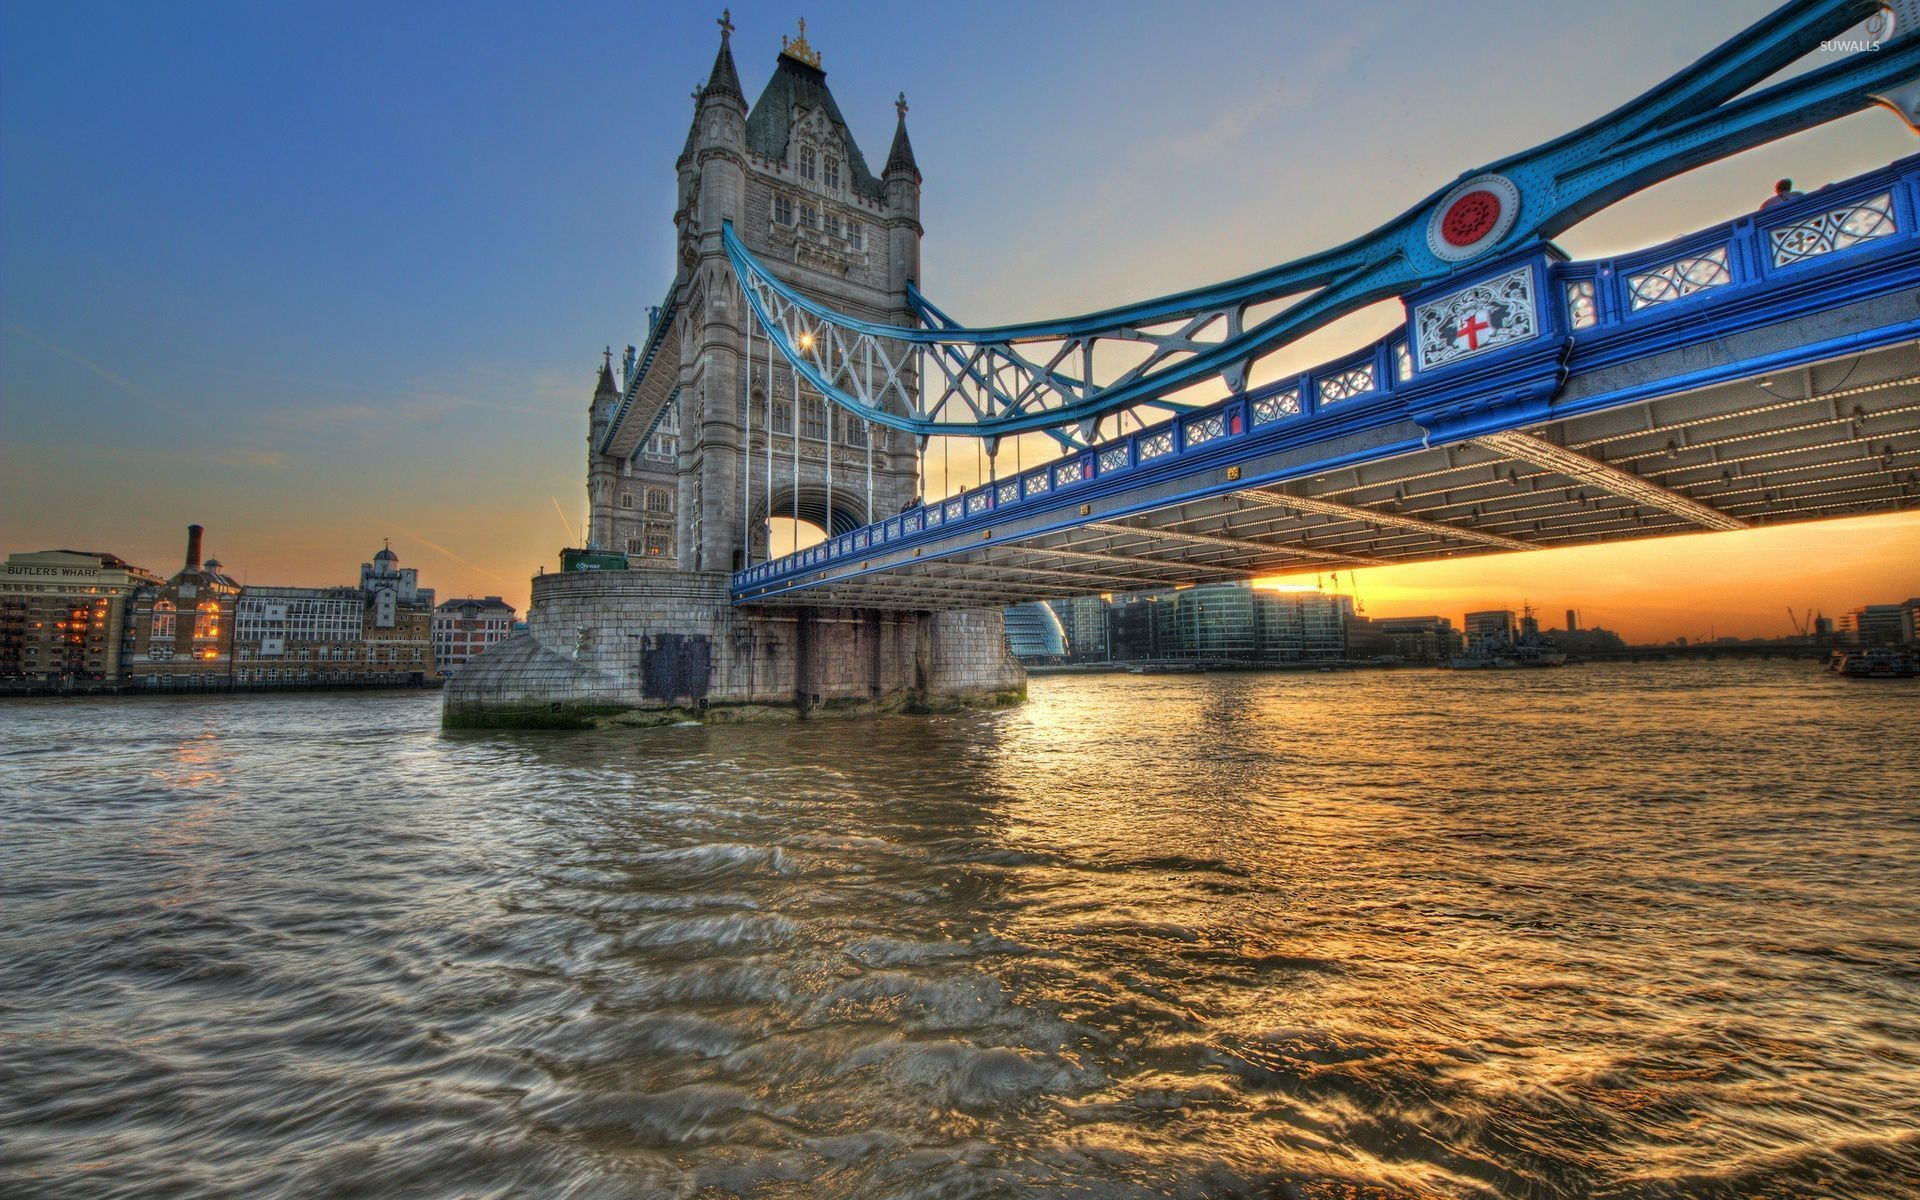 Res: 1920x1200, Tower Bridge, London wallpaper